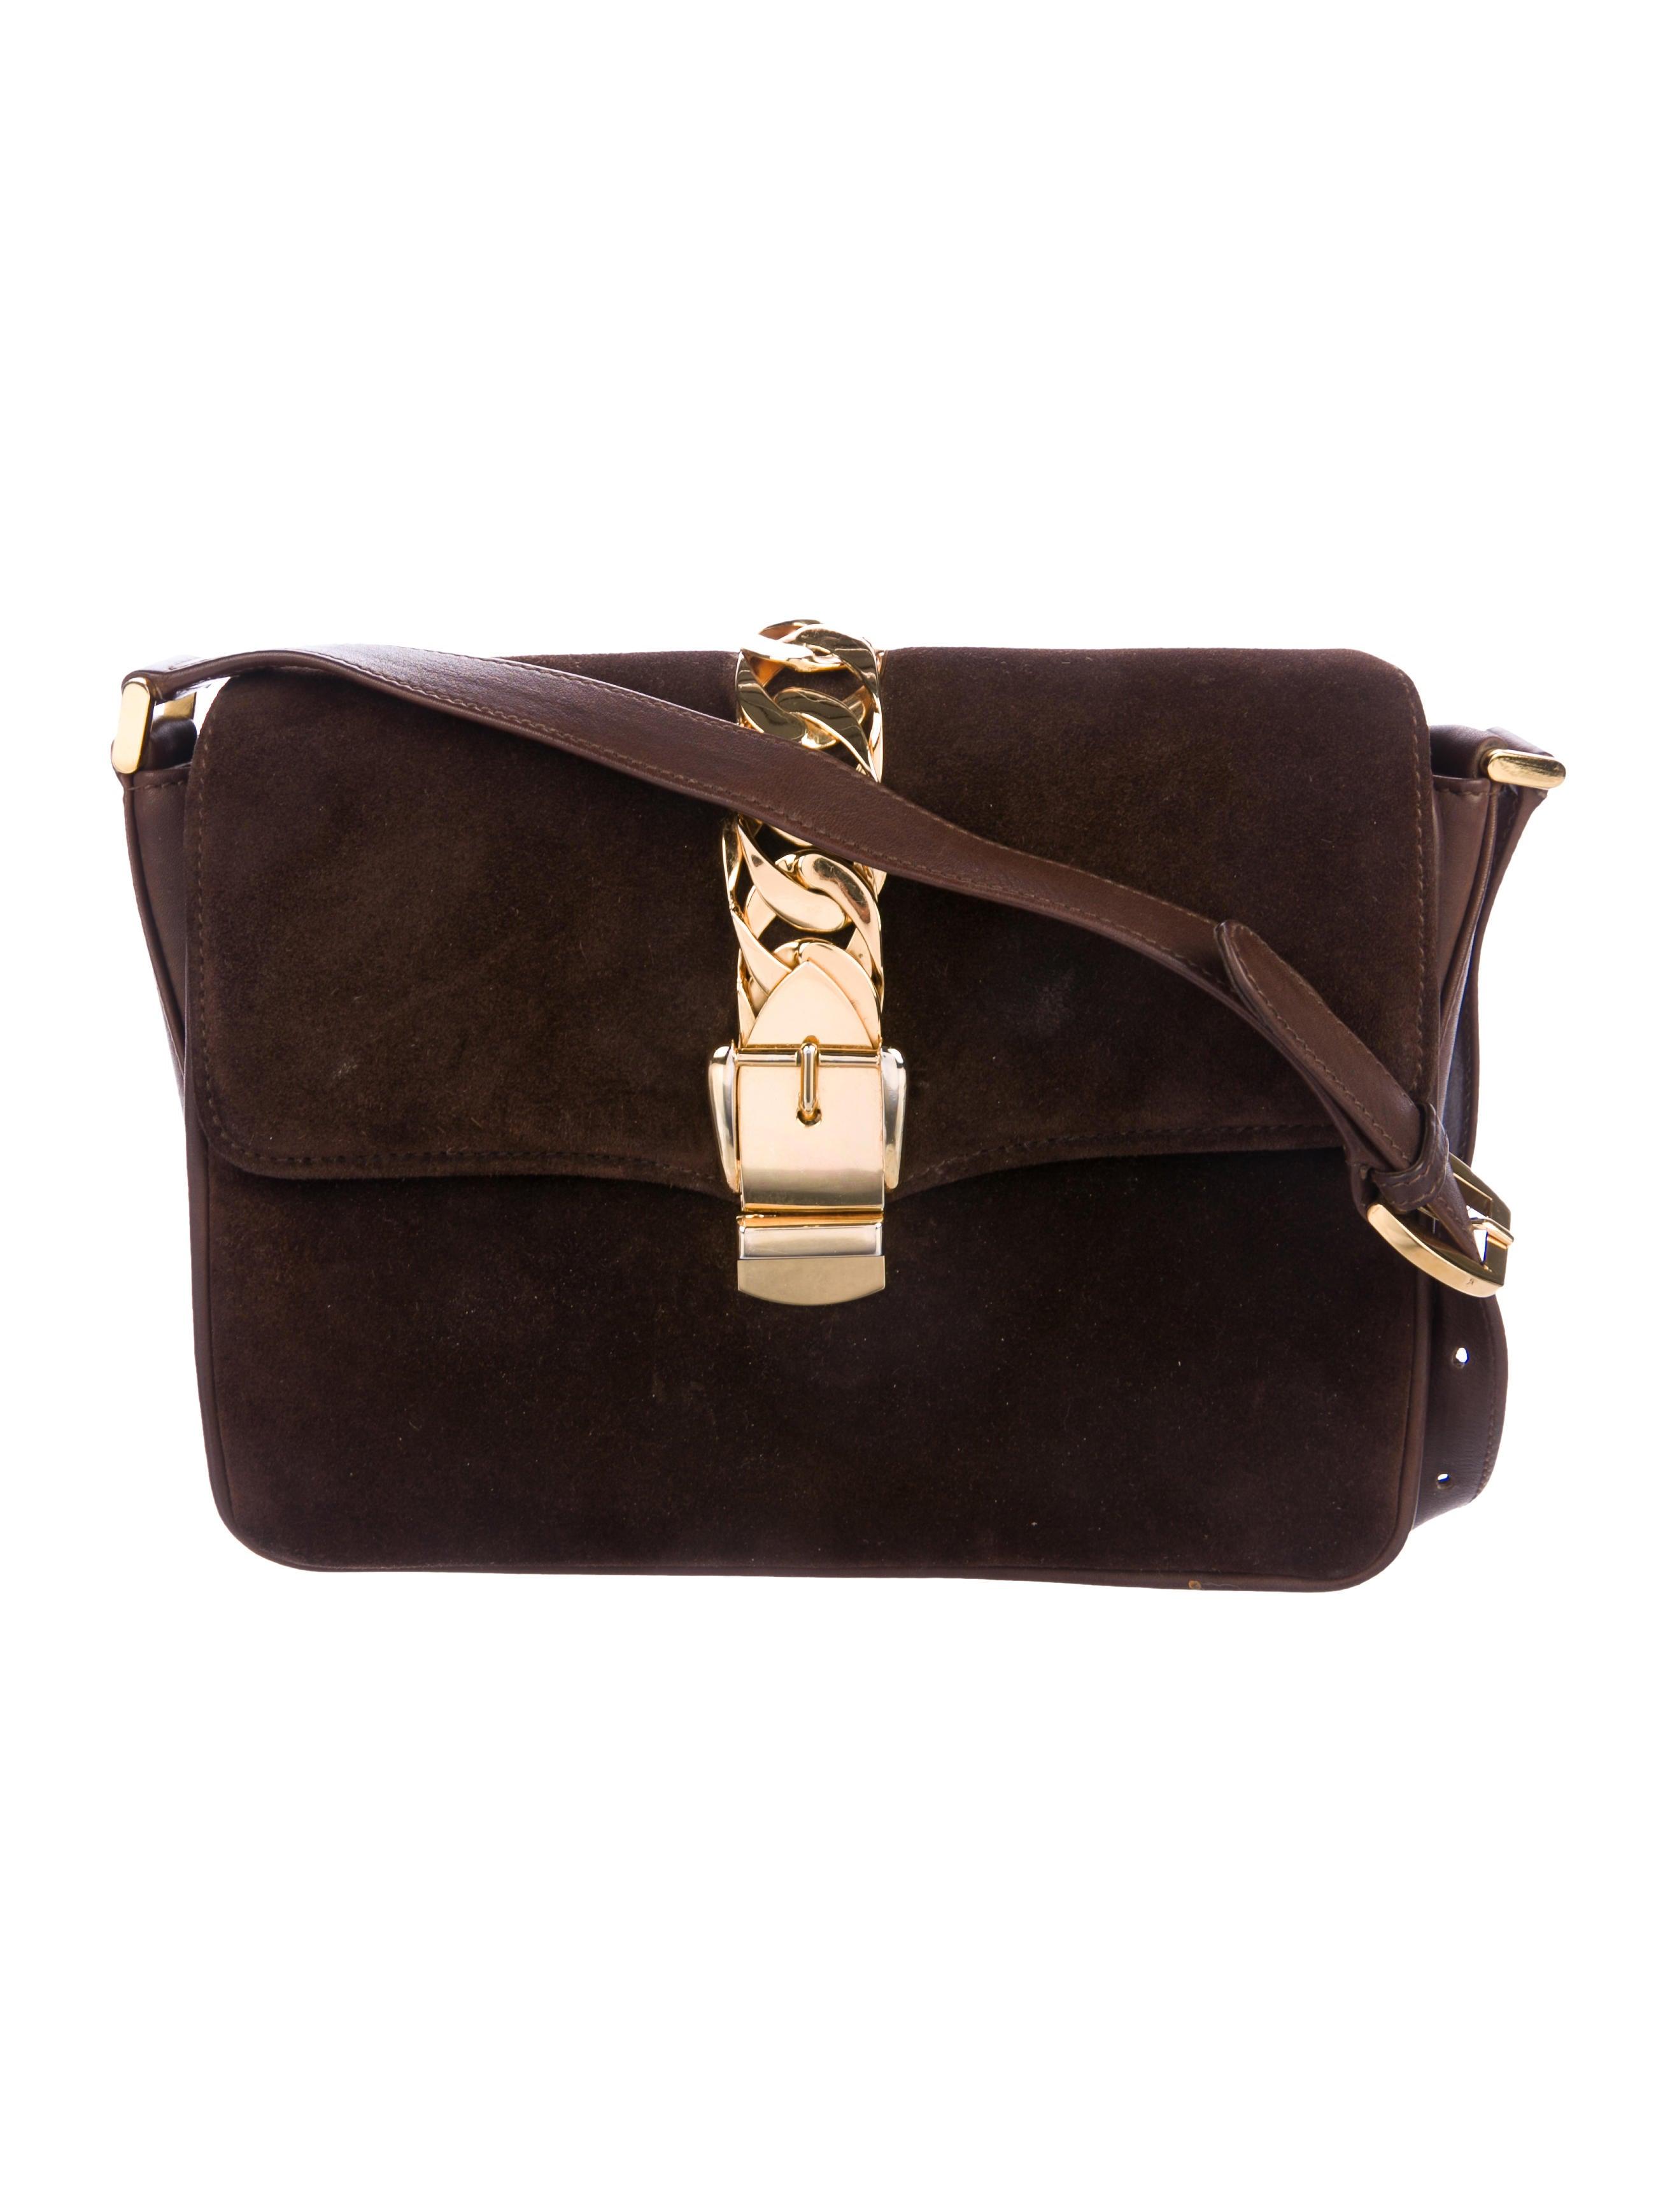 ae0135a1800c Gucci Webby Bee Embroidered Web Crossbody Bag - Handbags - GUC127175 ...